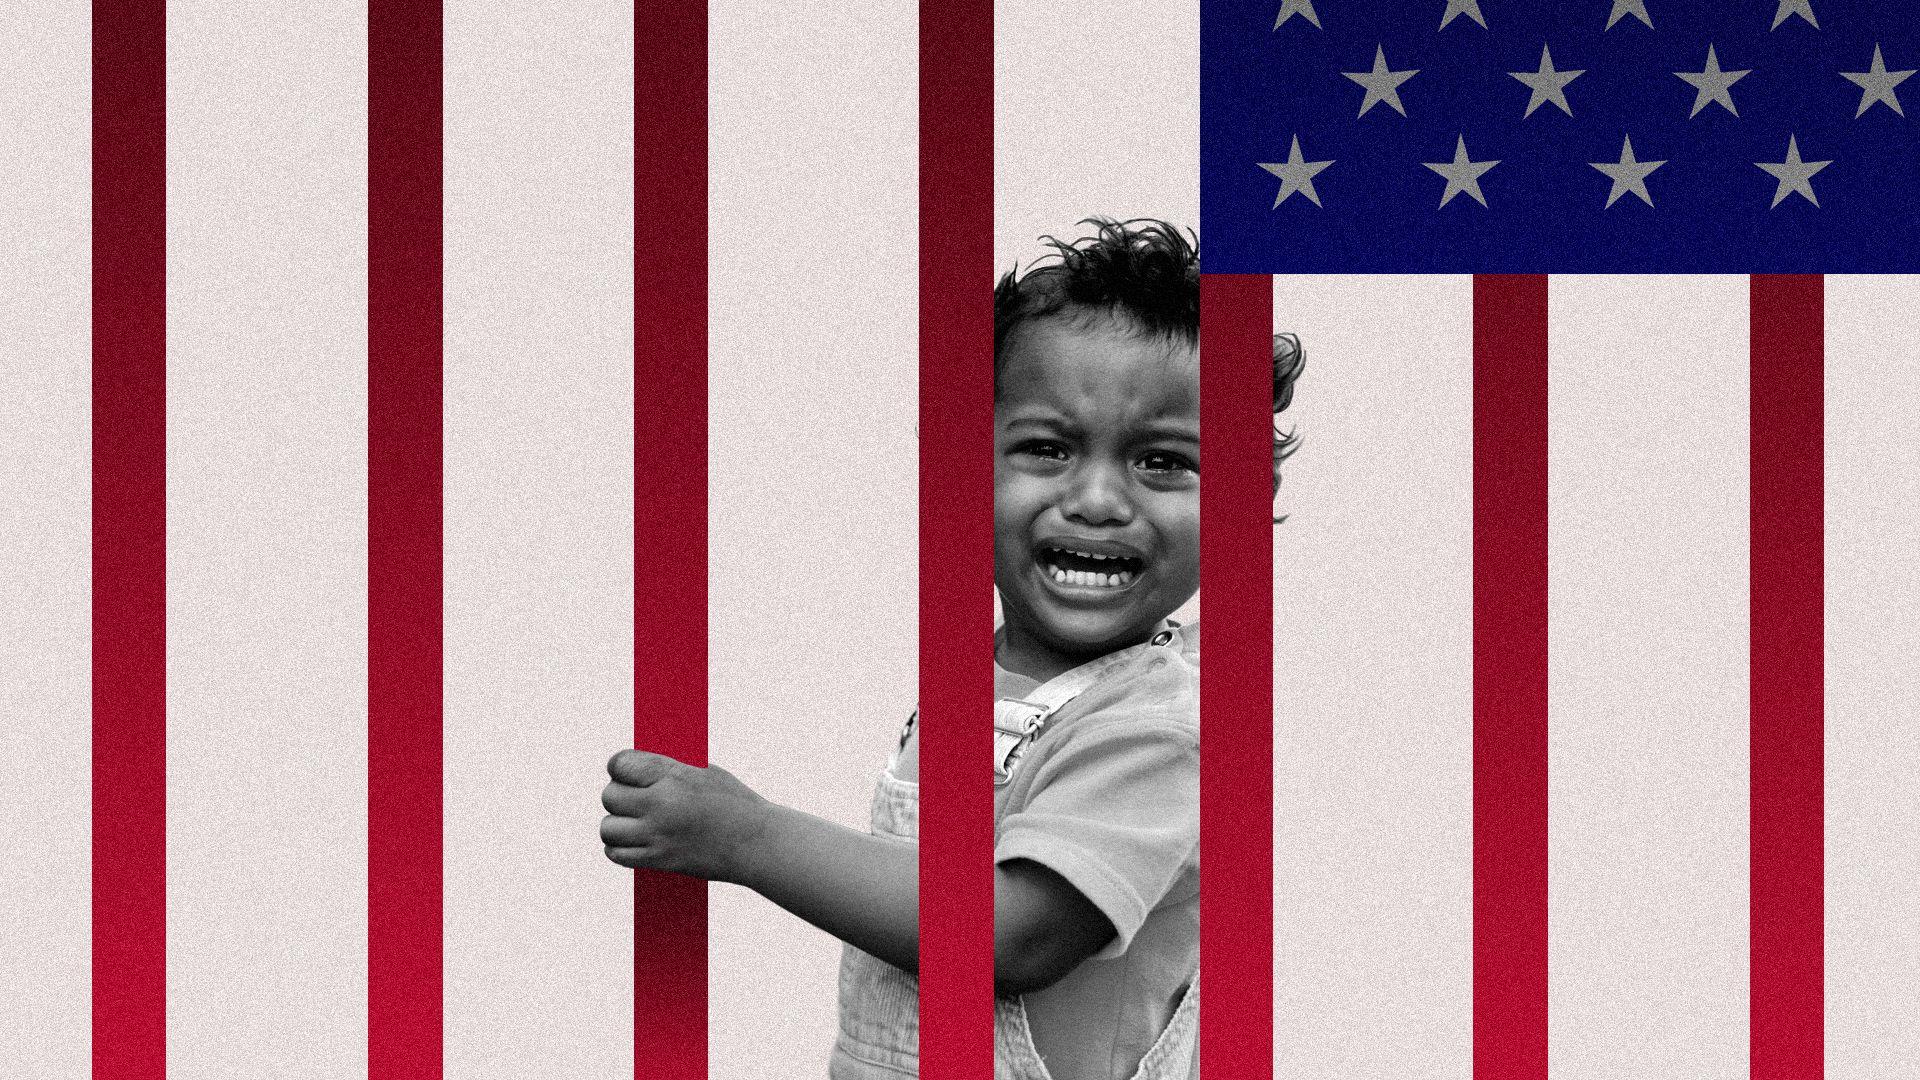 USA Border - Magazine cover